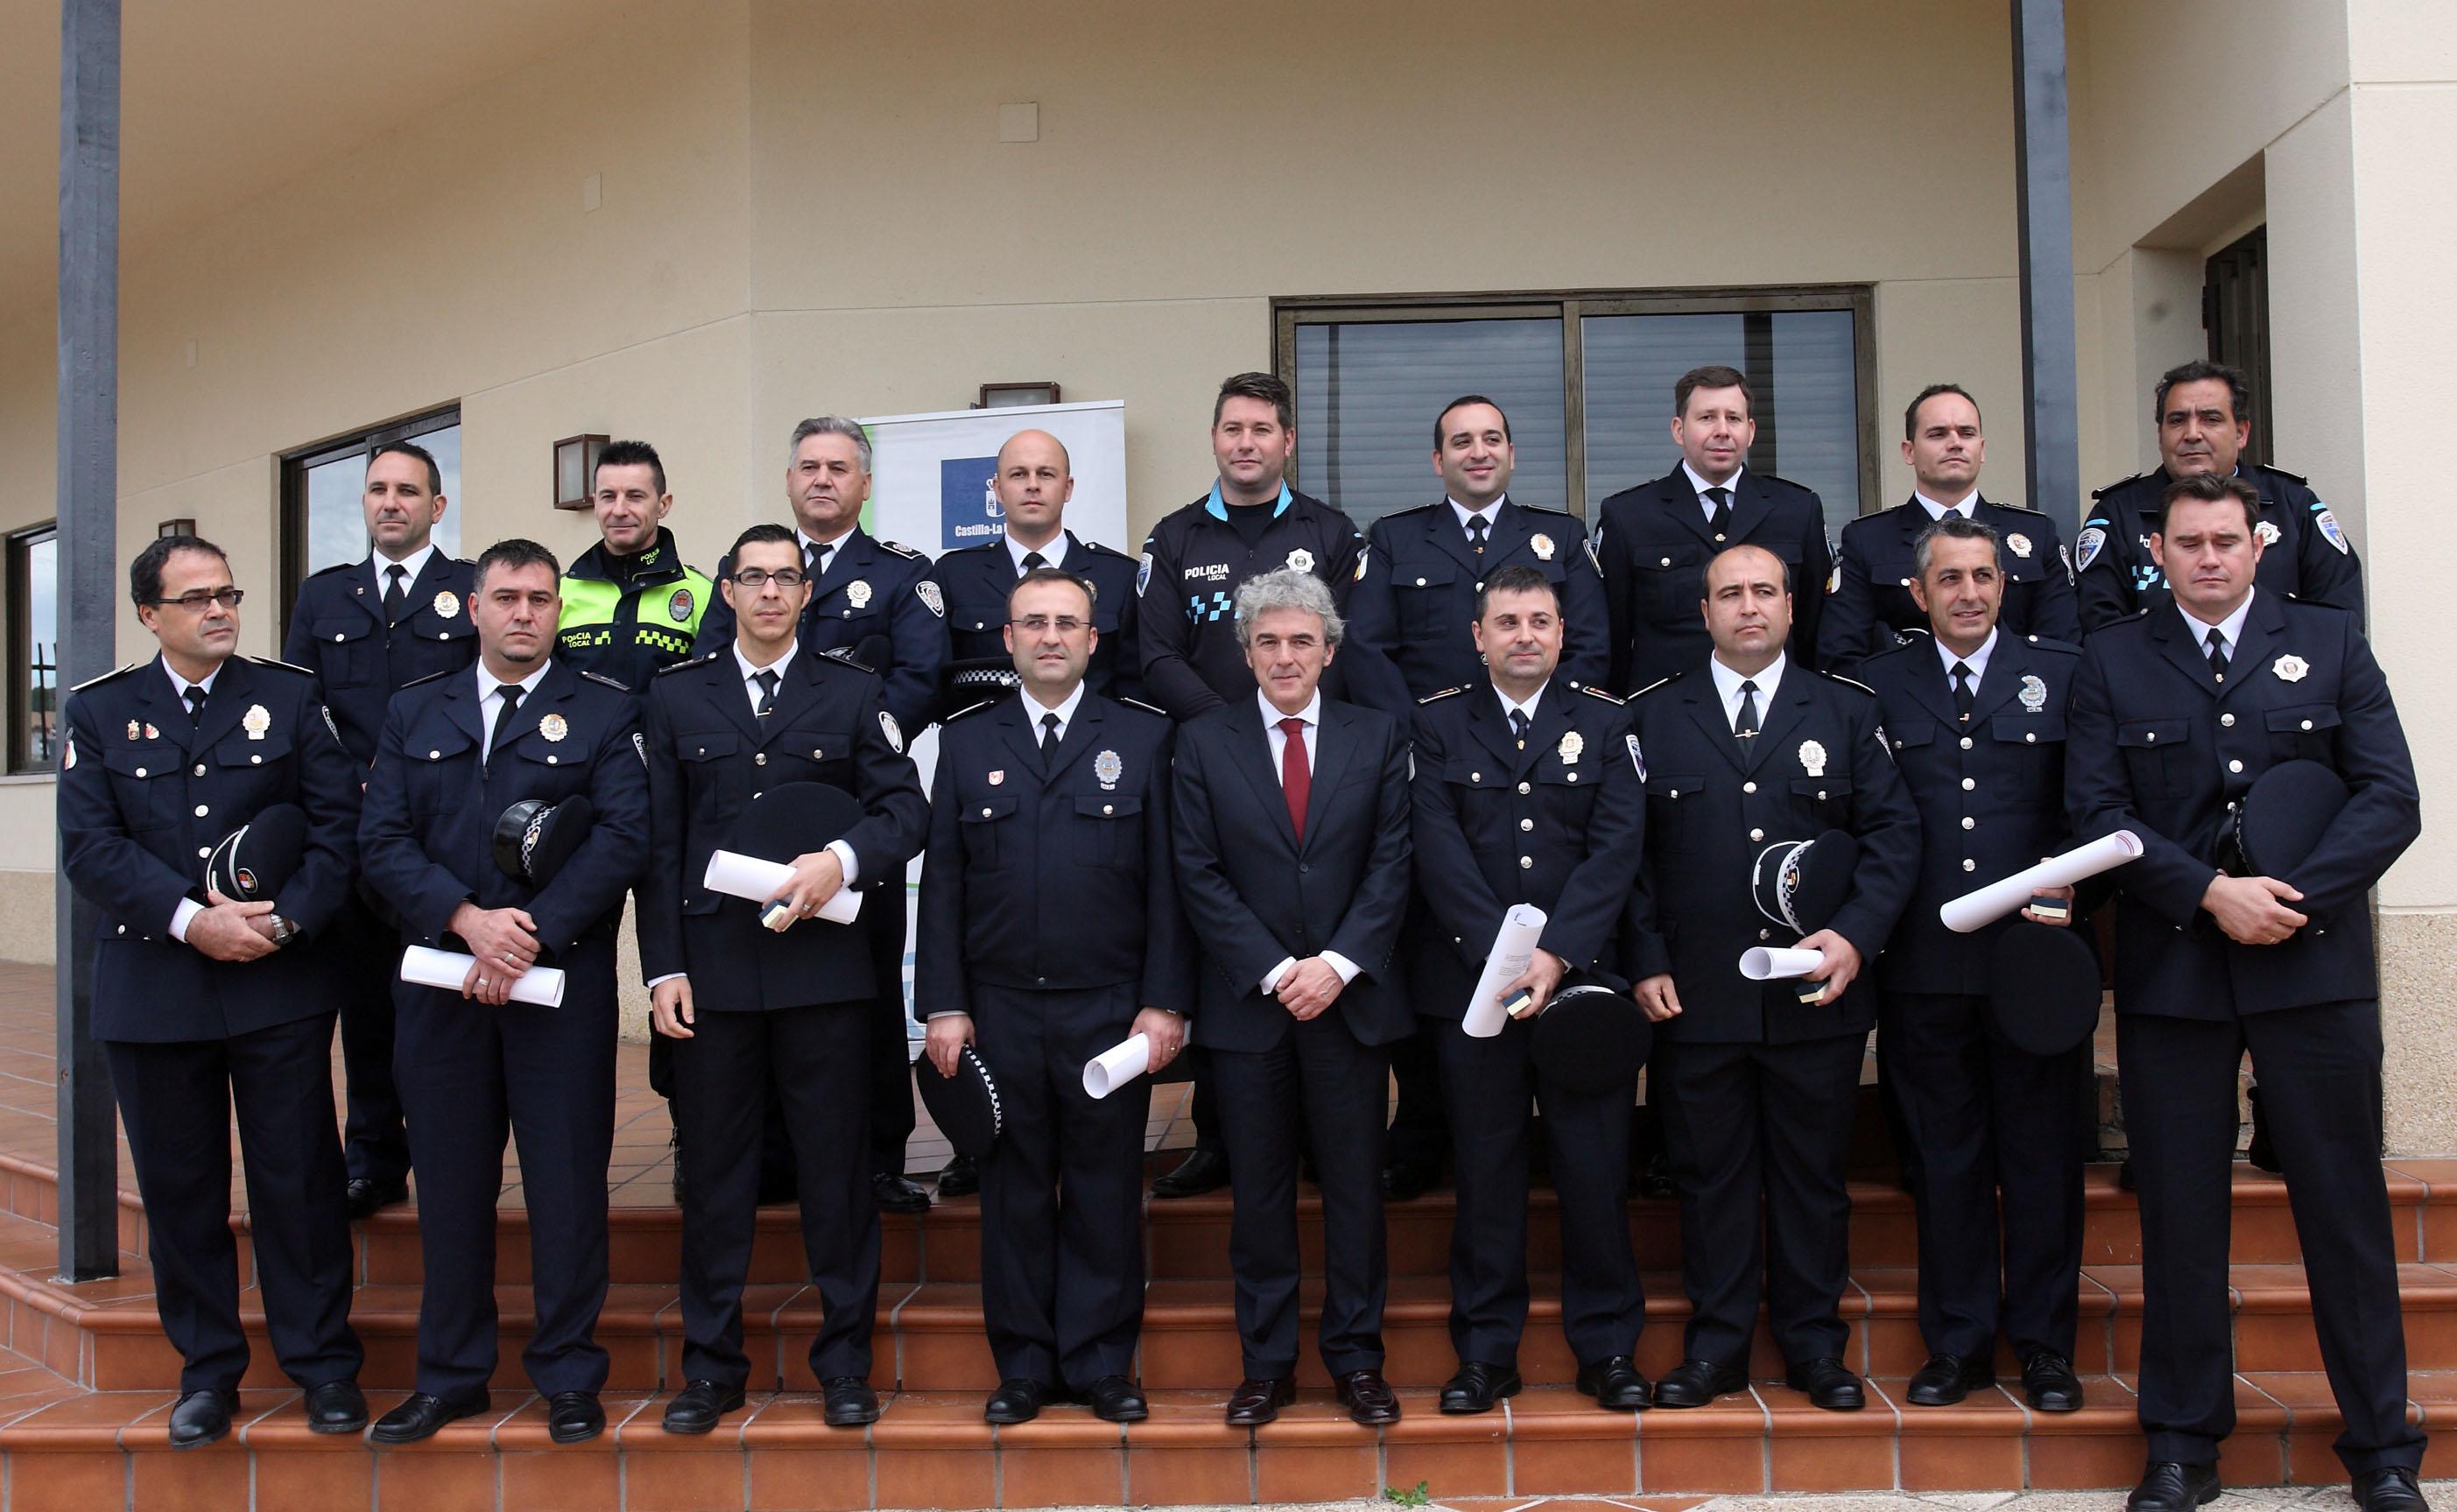 FOTO ENTREGA DISTINTIVOS POLICIA ADMINISTRATIVA DIC 2014